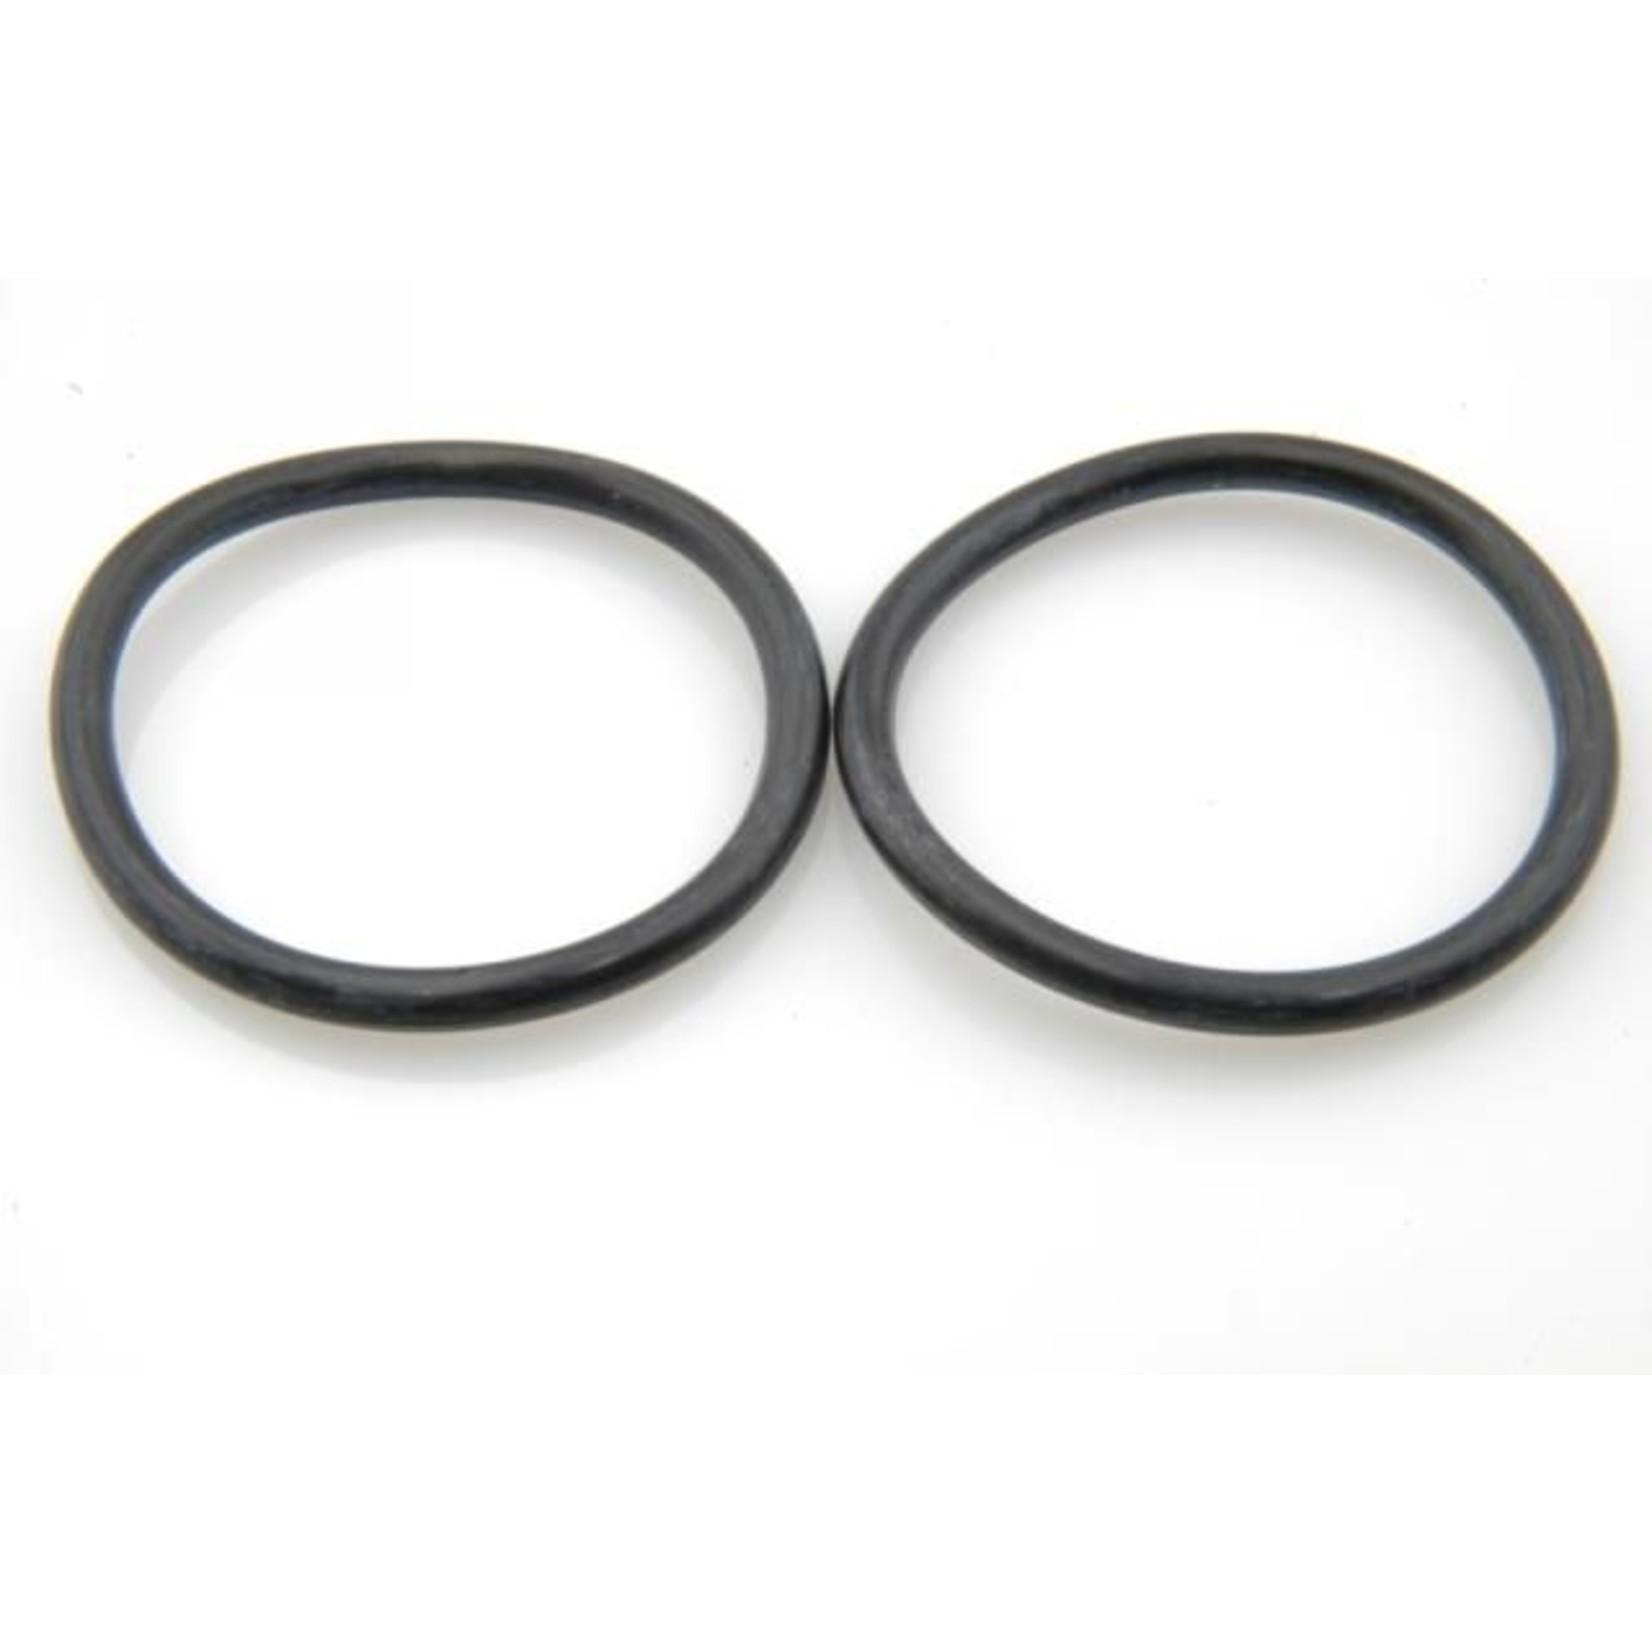 Ring seals brake housing -02/58 piston 38mm Nr Org: DS453119